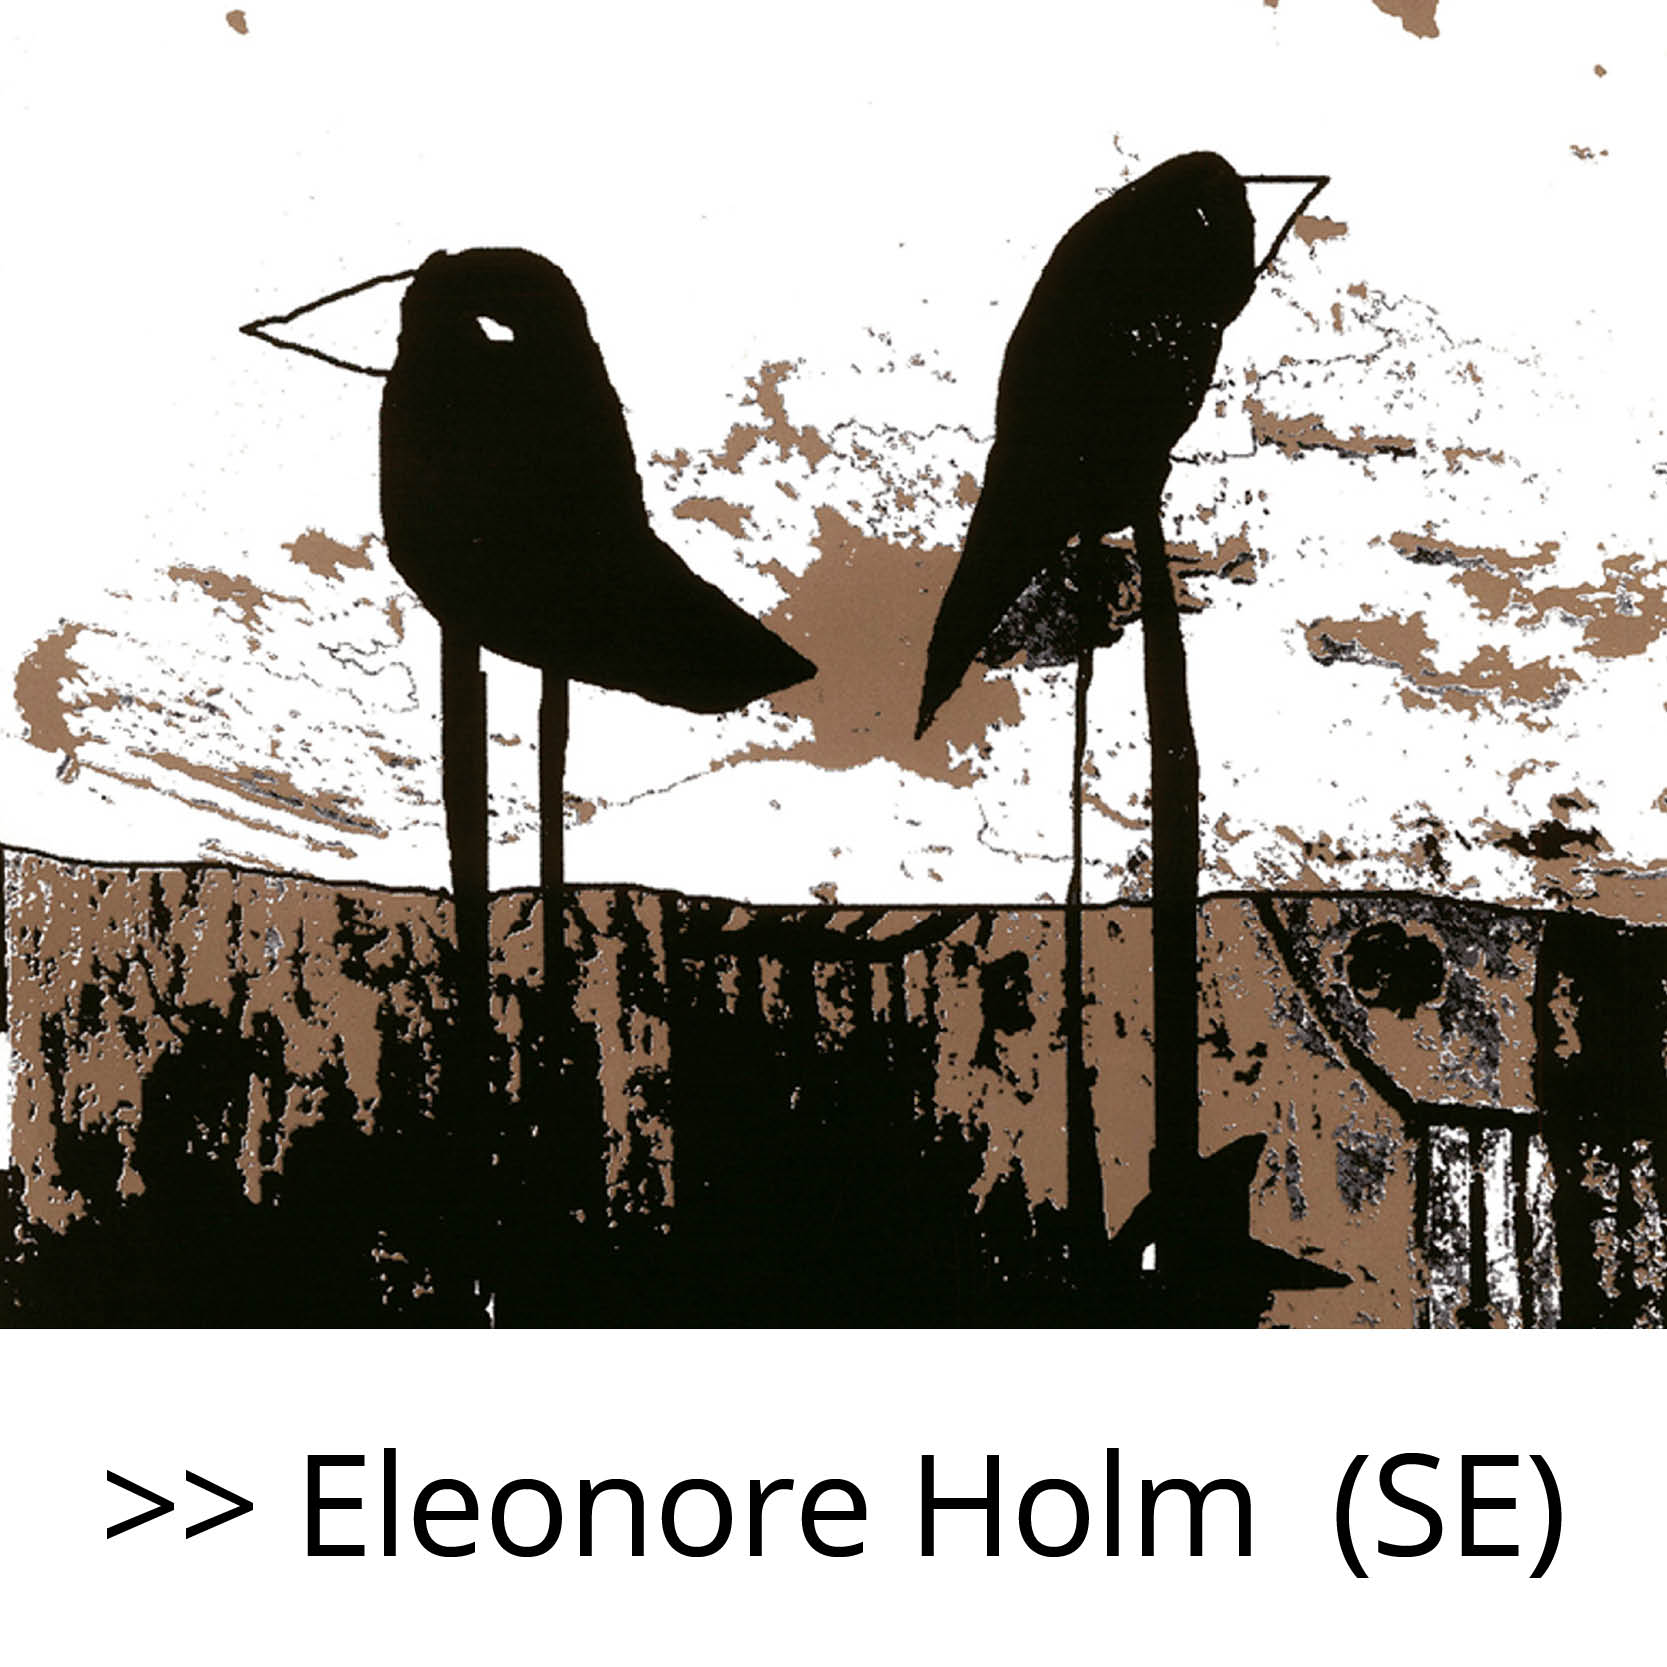 Eleonore_Holm_(SE)